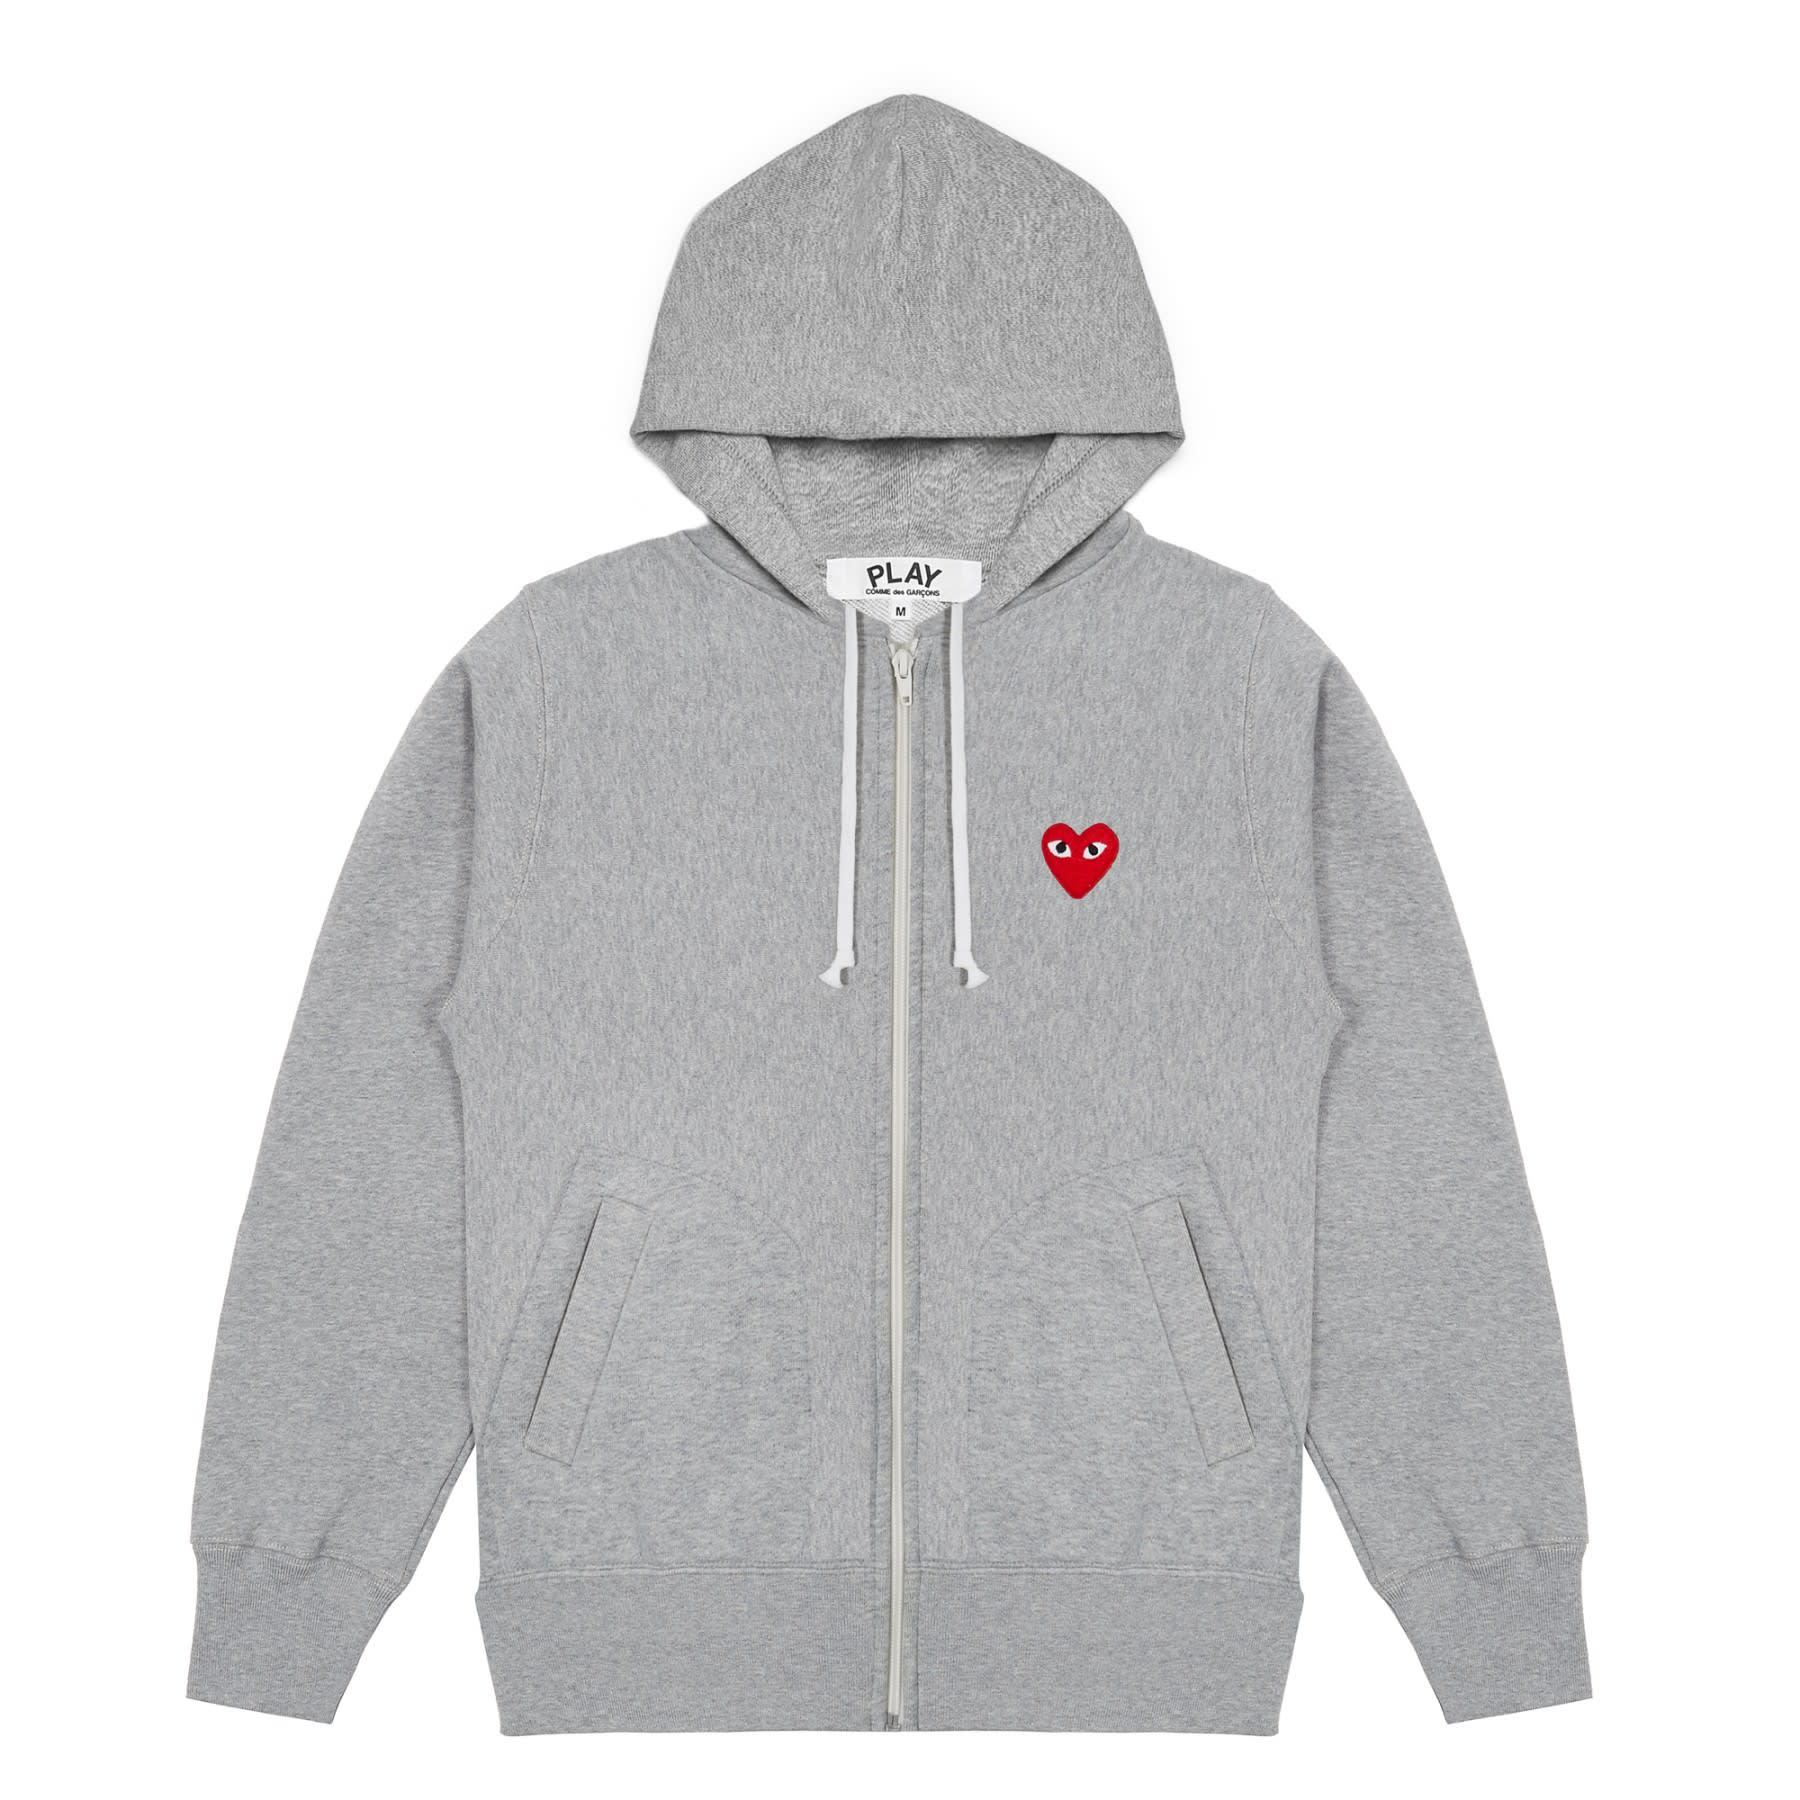 Comme Des Garcons Play Grey PLAY Printed Heart Zip Through Hoodie